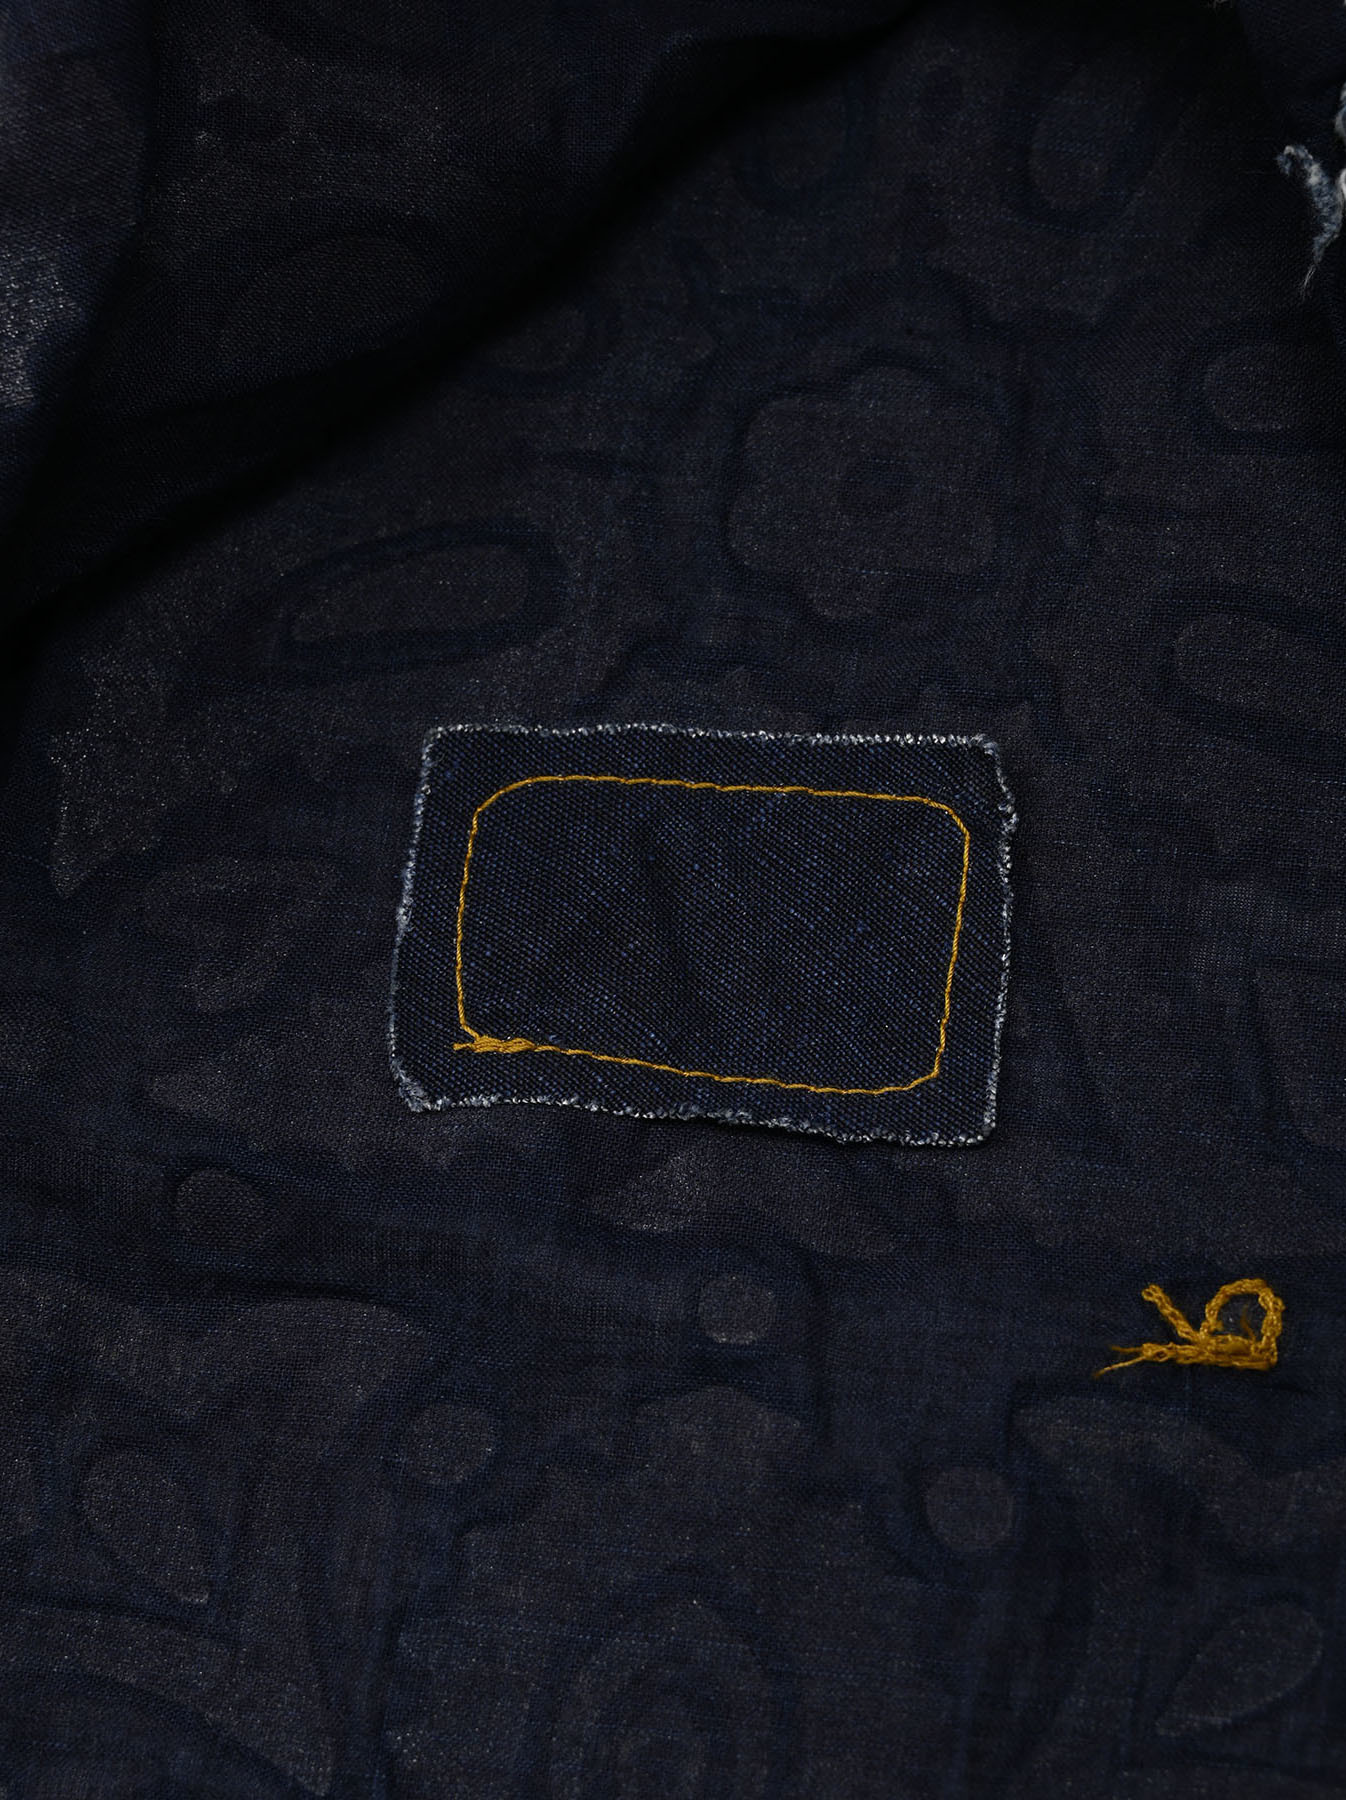 Indigo Bonding Sleeveless Top(0721)-9